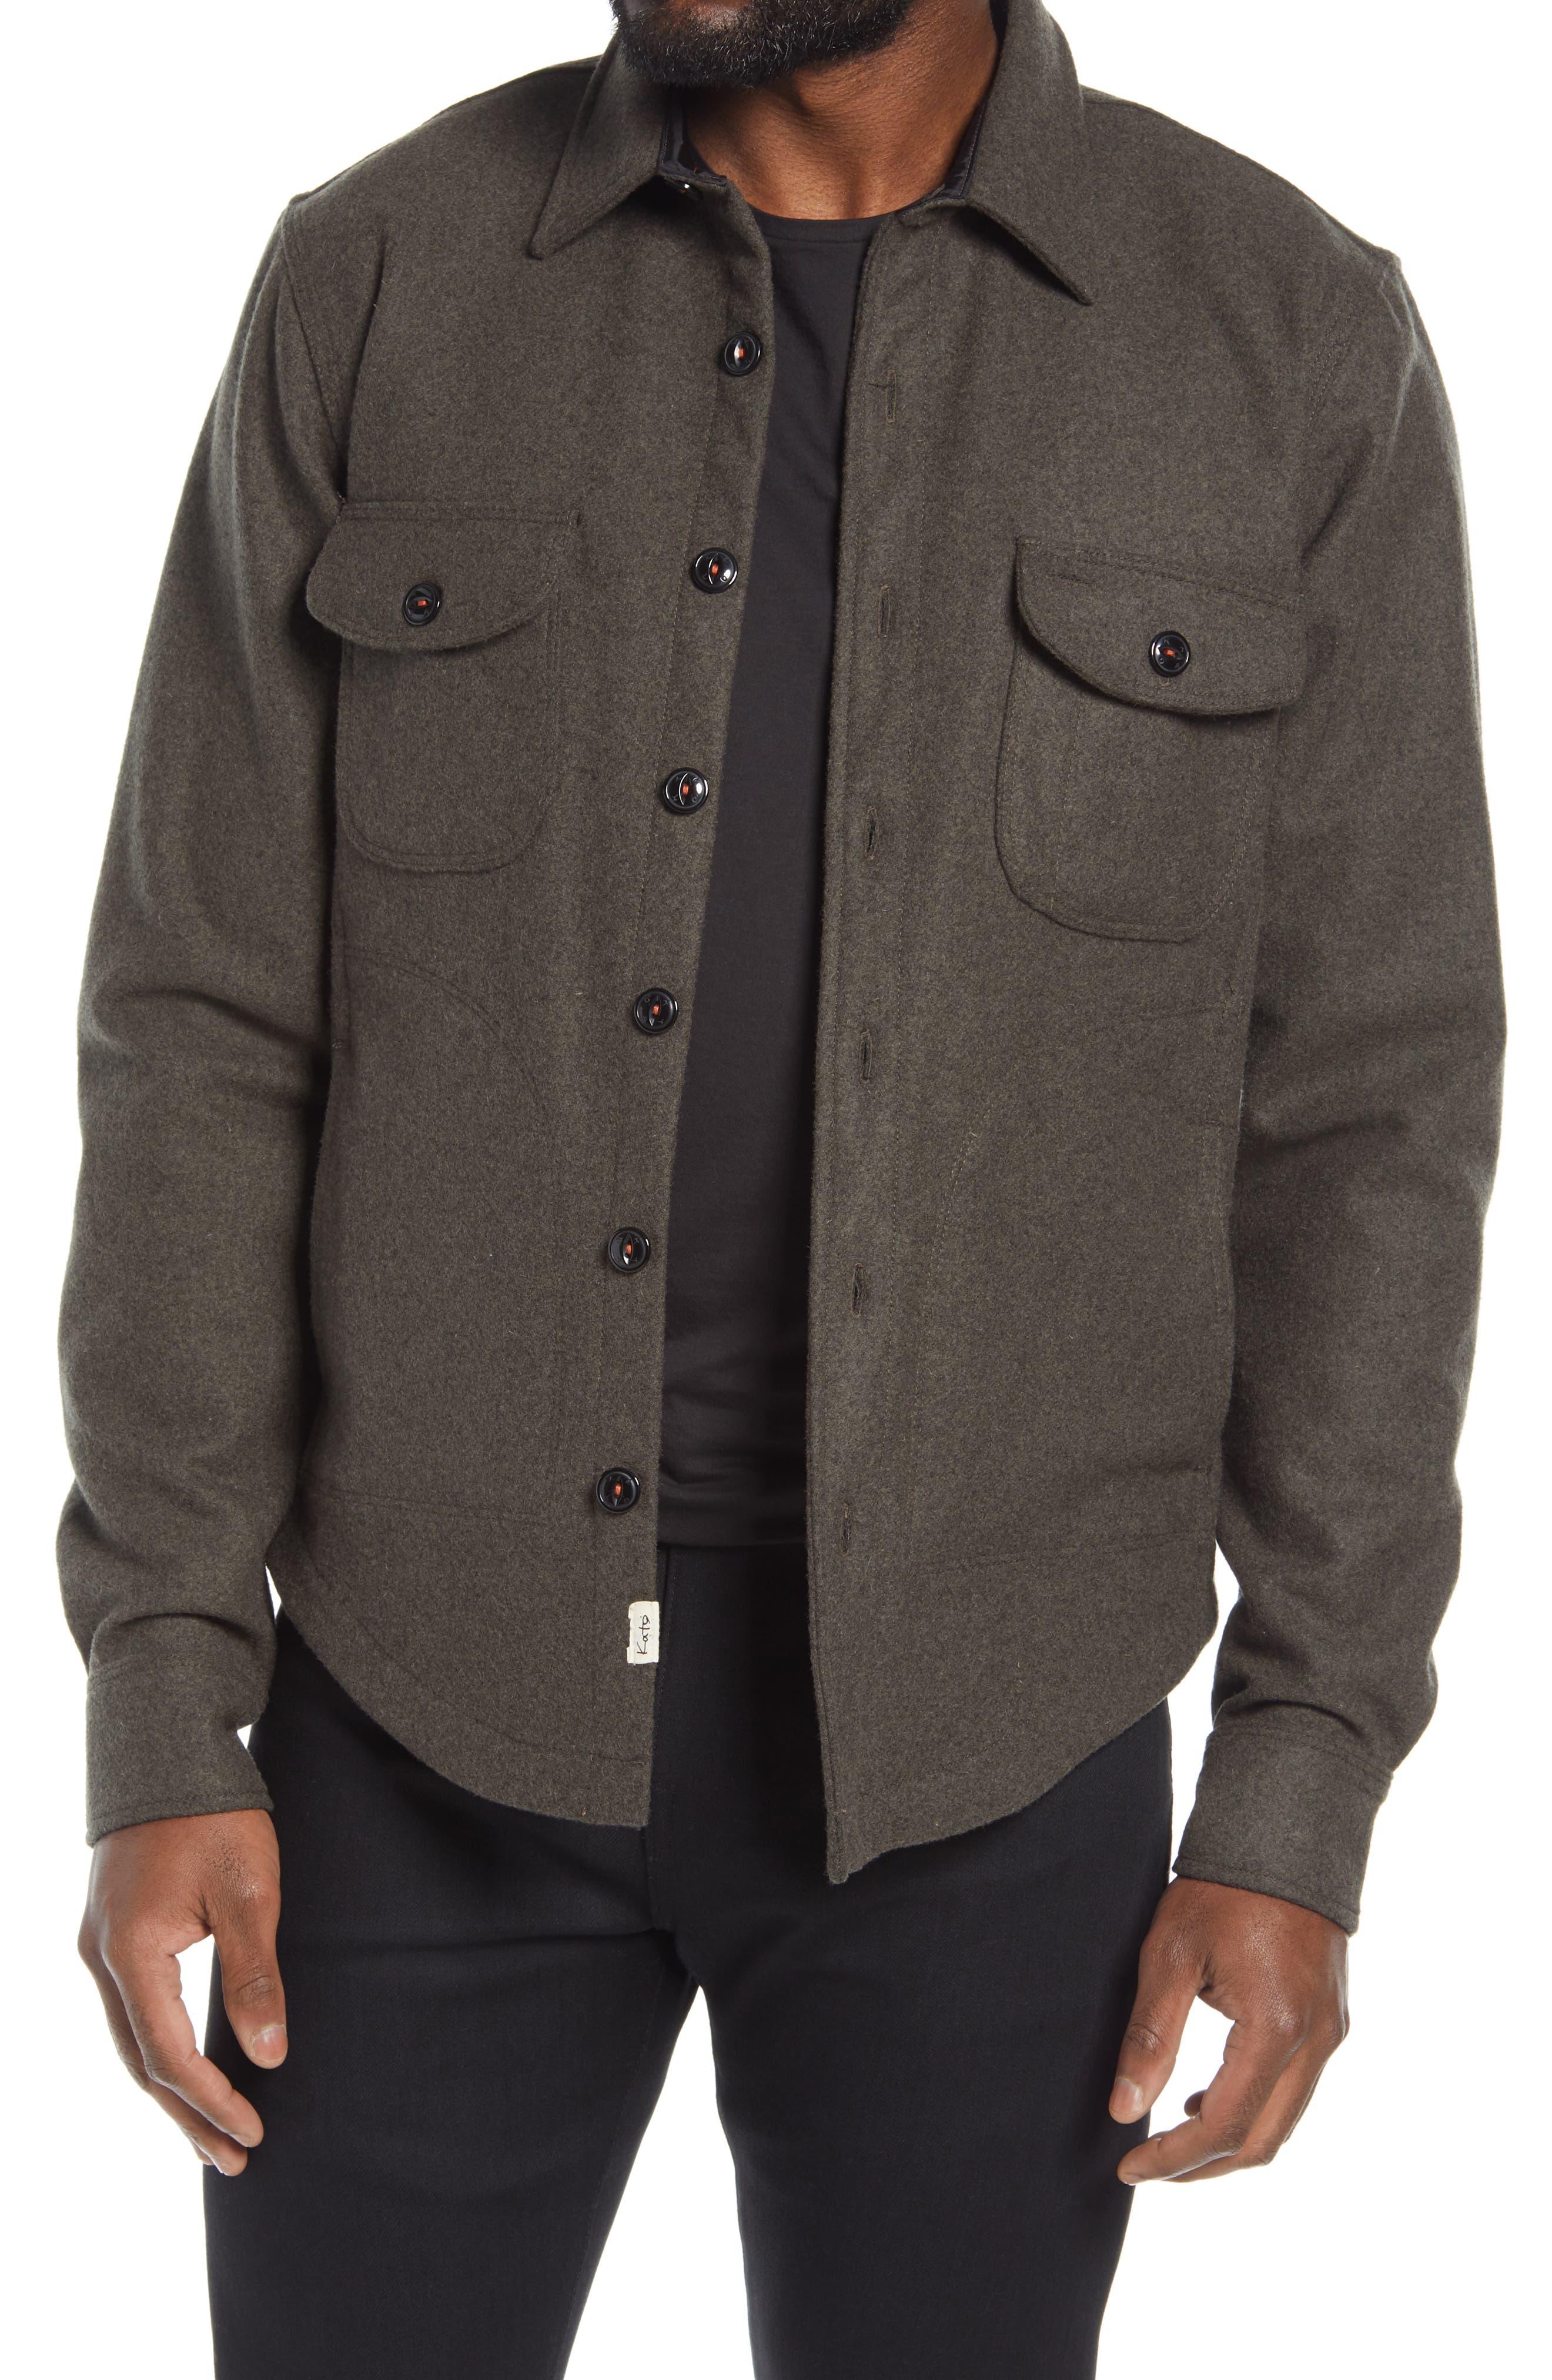 Heavy Melton Wool Jacket